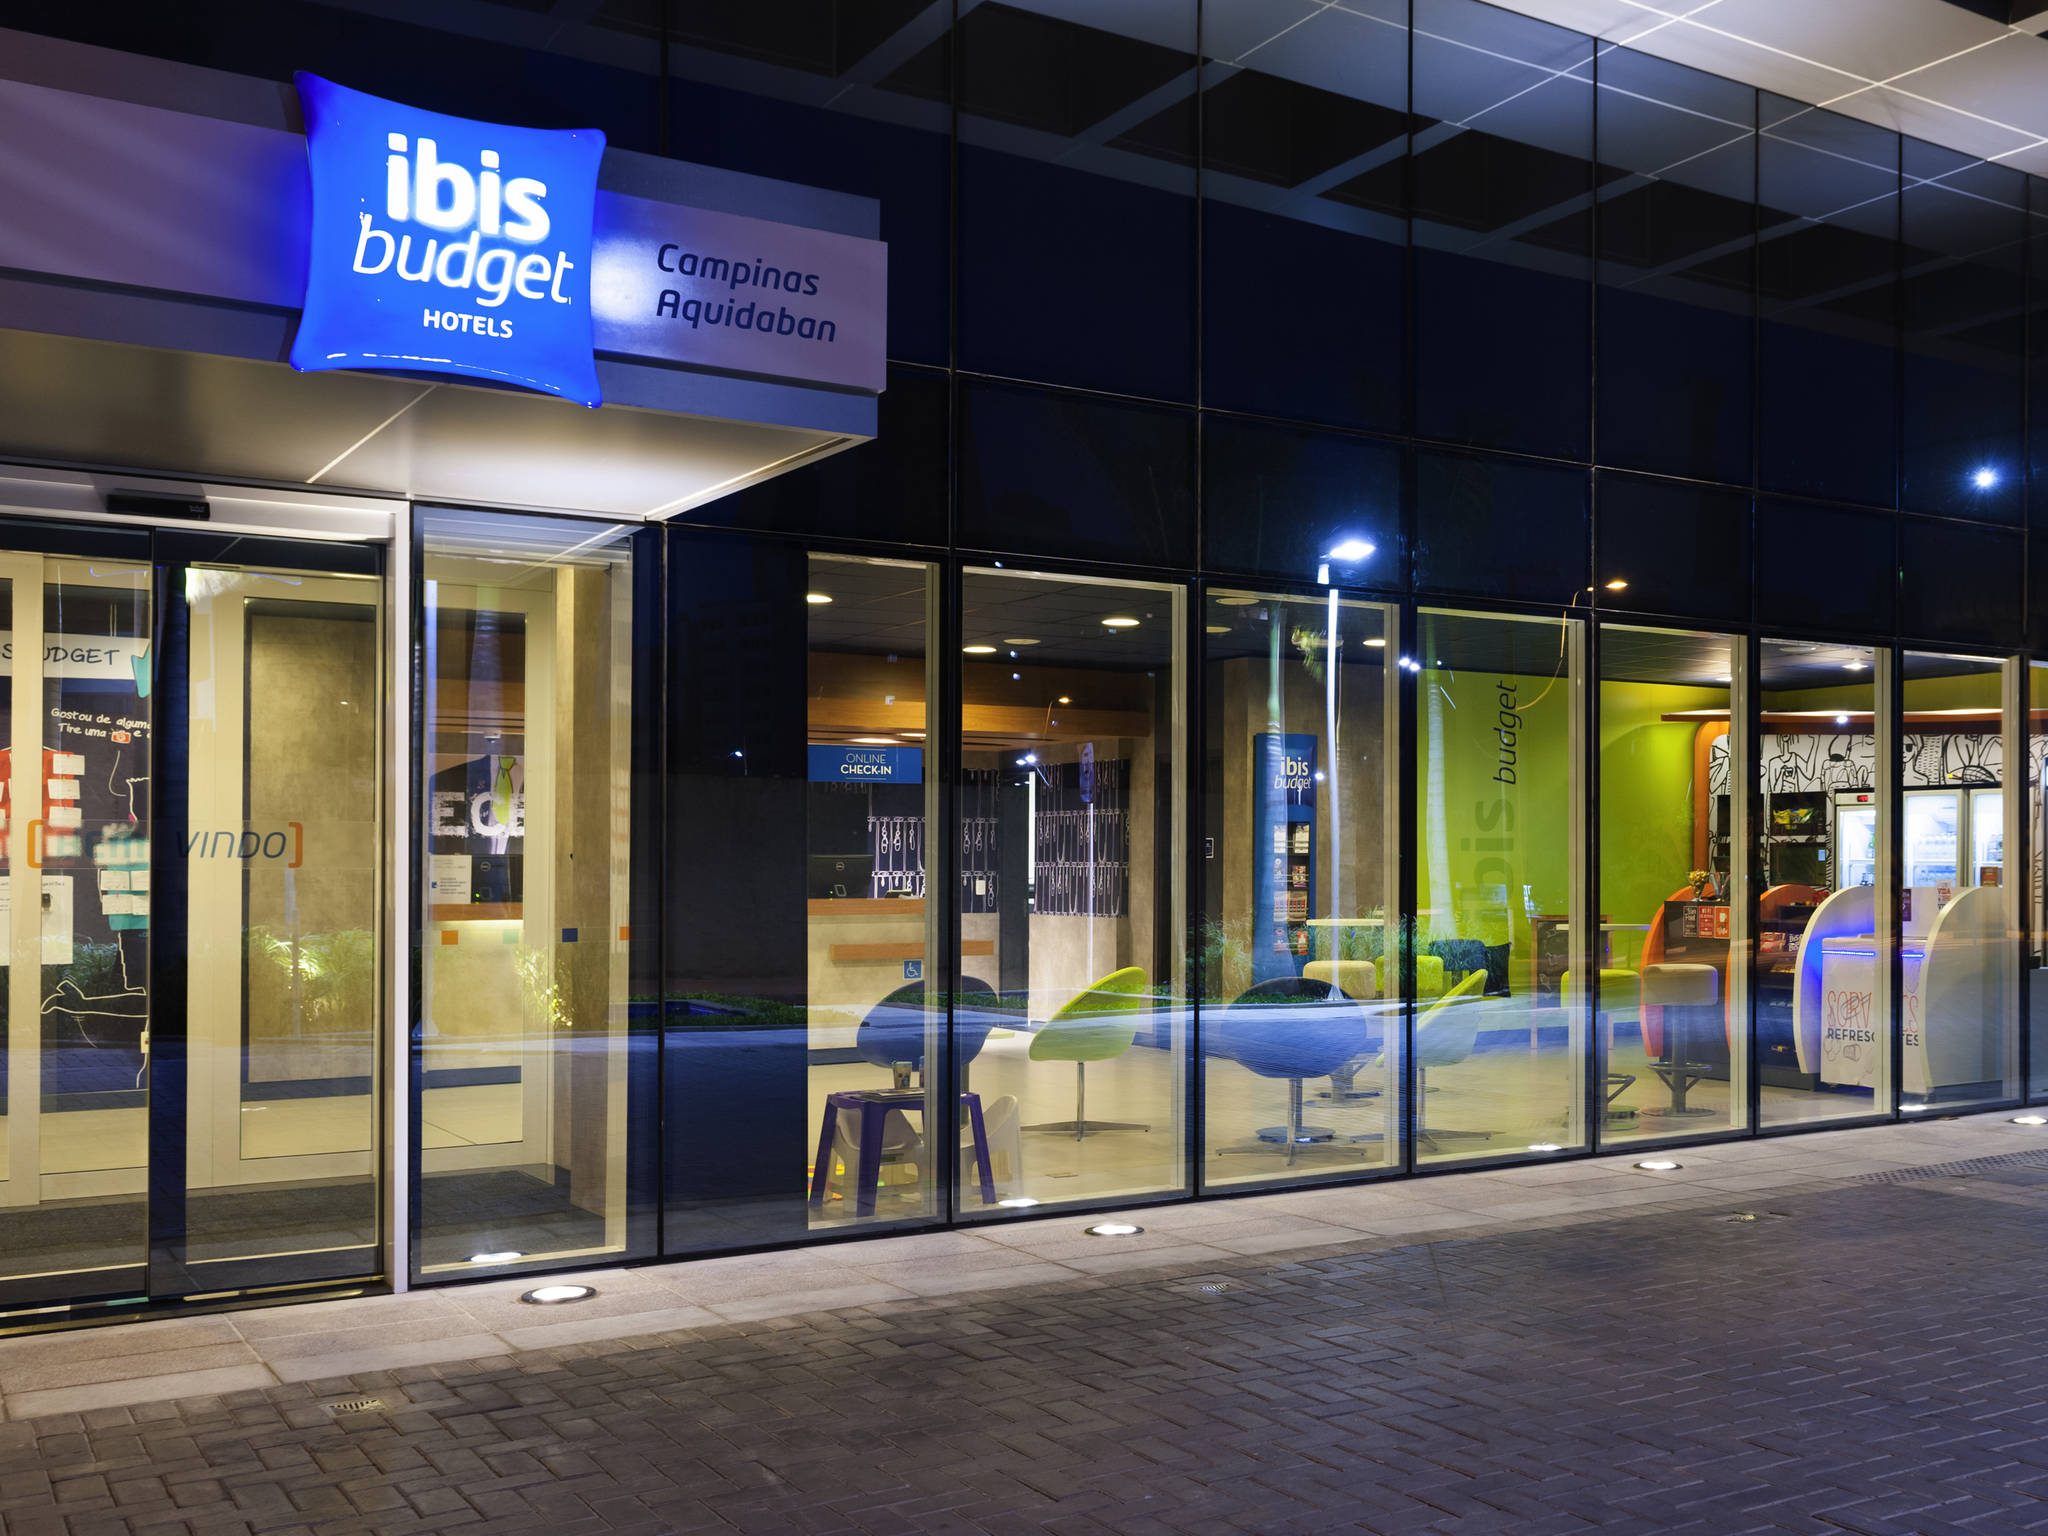 Hotel - ibis budget Campinas Aquidaban